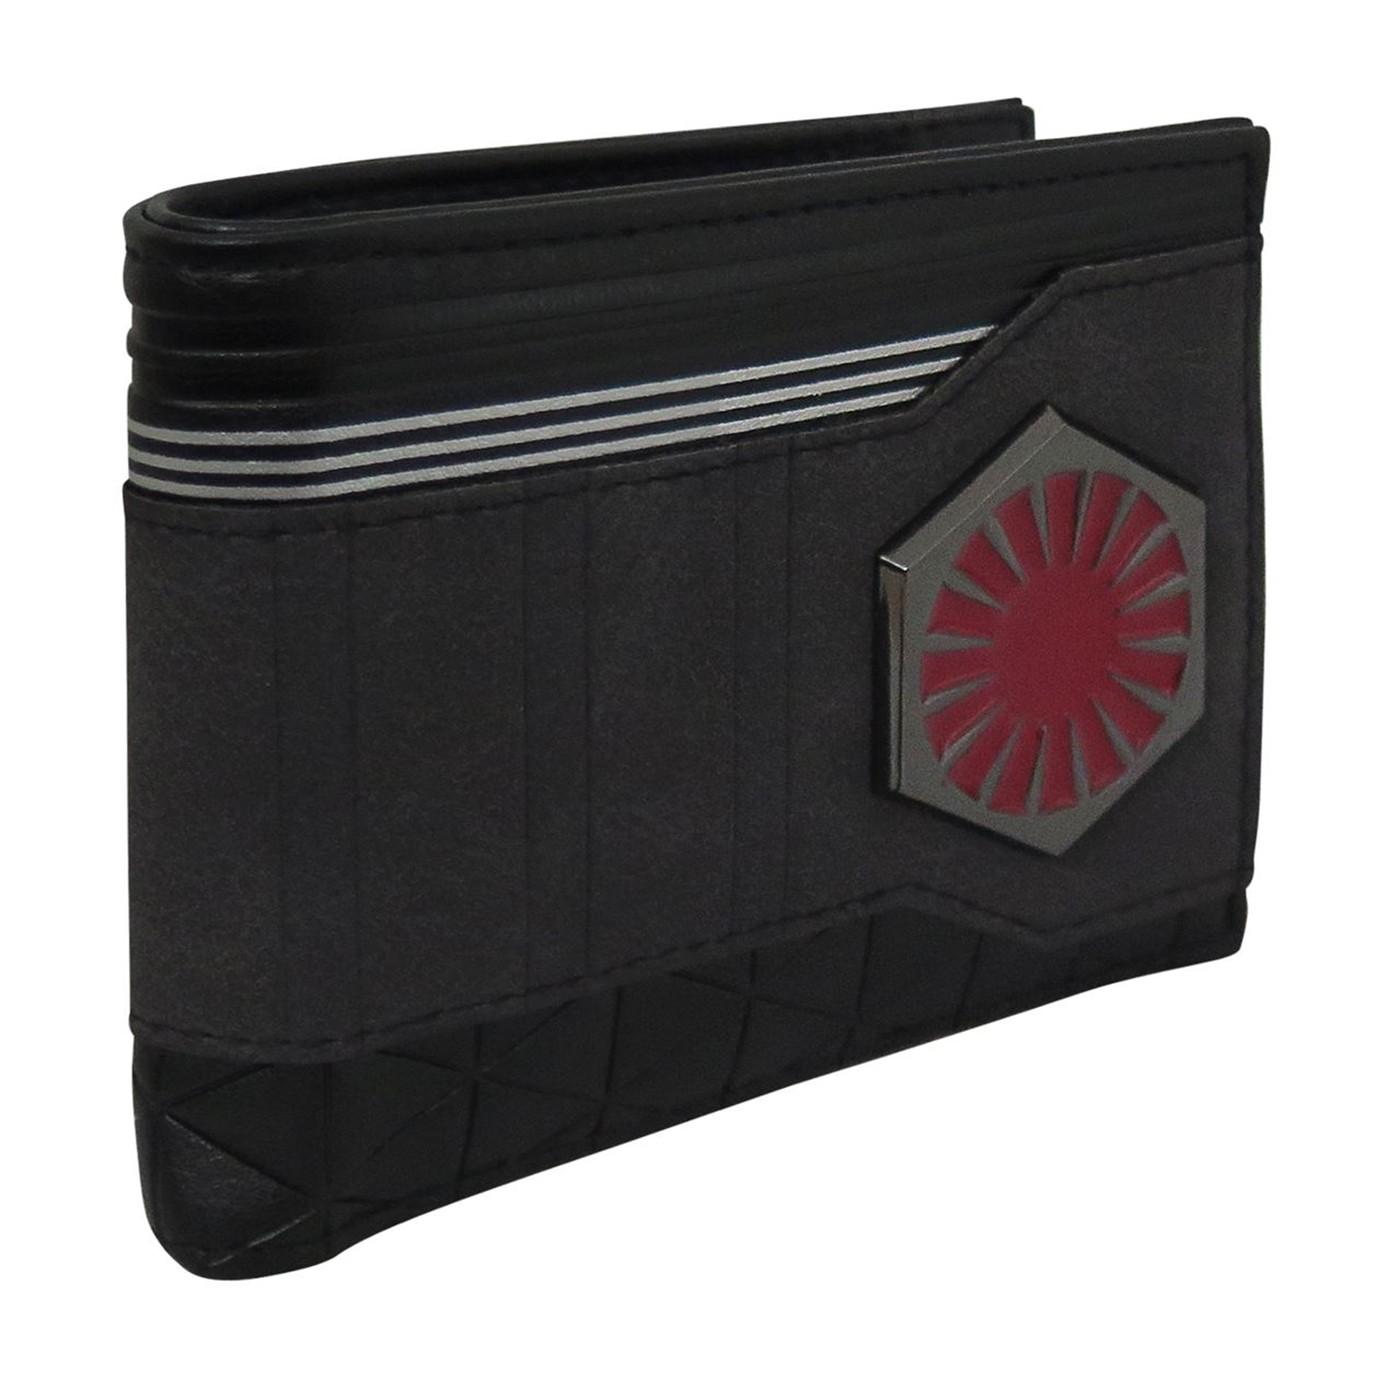 Star Wars Last Jedi First Order Men's Bi-Fold Wallet